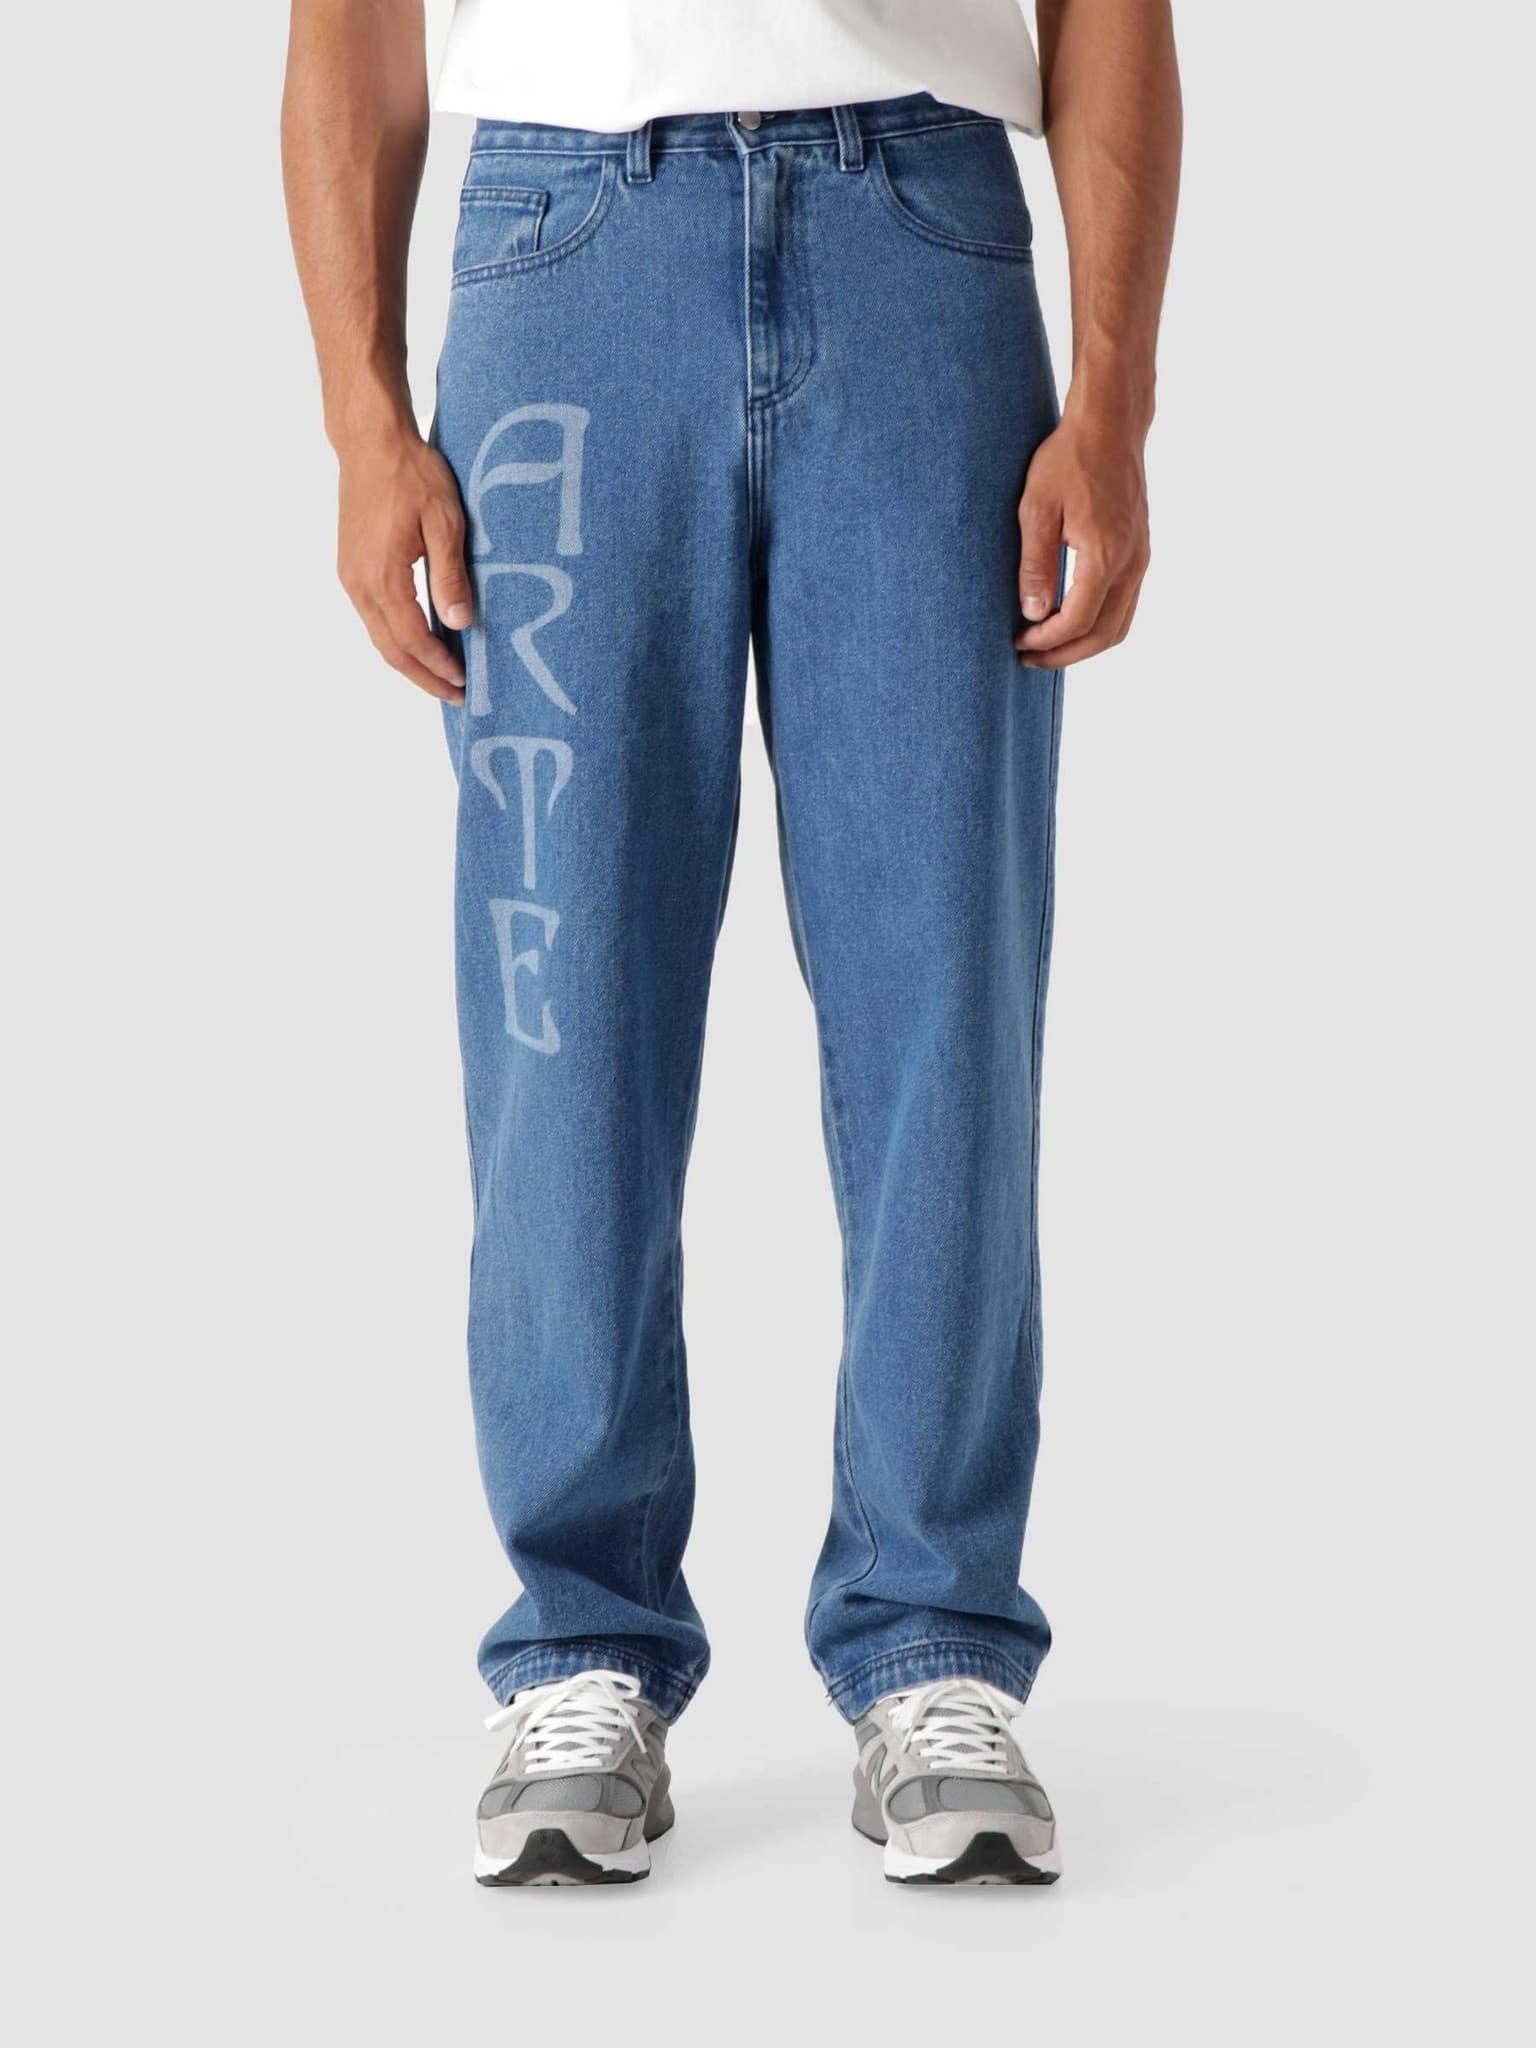 Paul Front Logo Pants Light Blue Denim AW21-002P